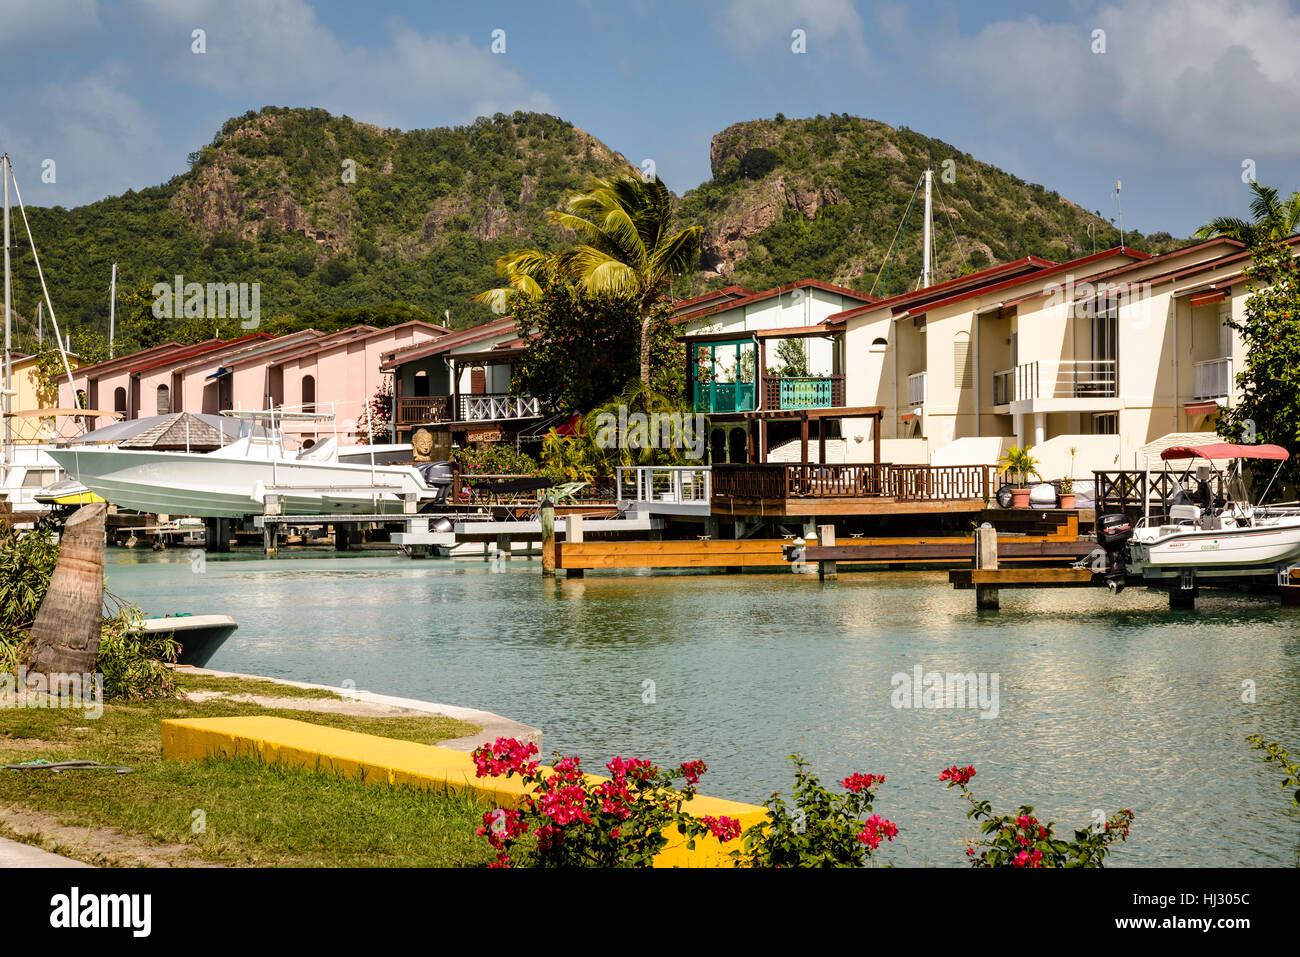 Villas, Jolly Harbour Marina, Antigua - Stock Image